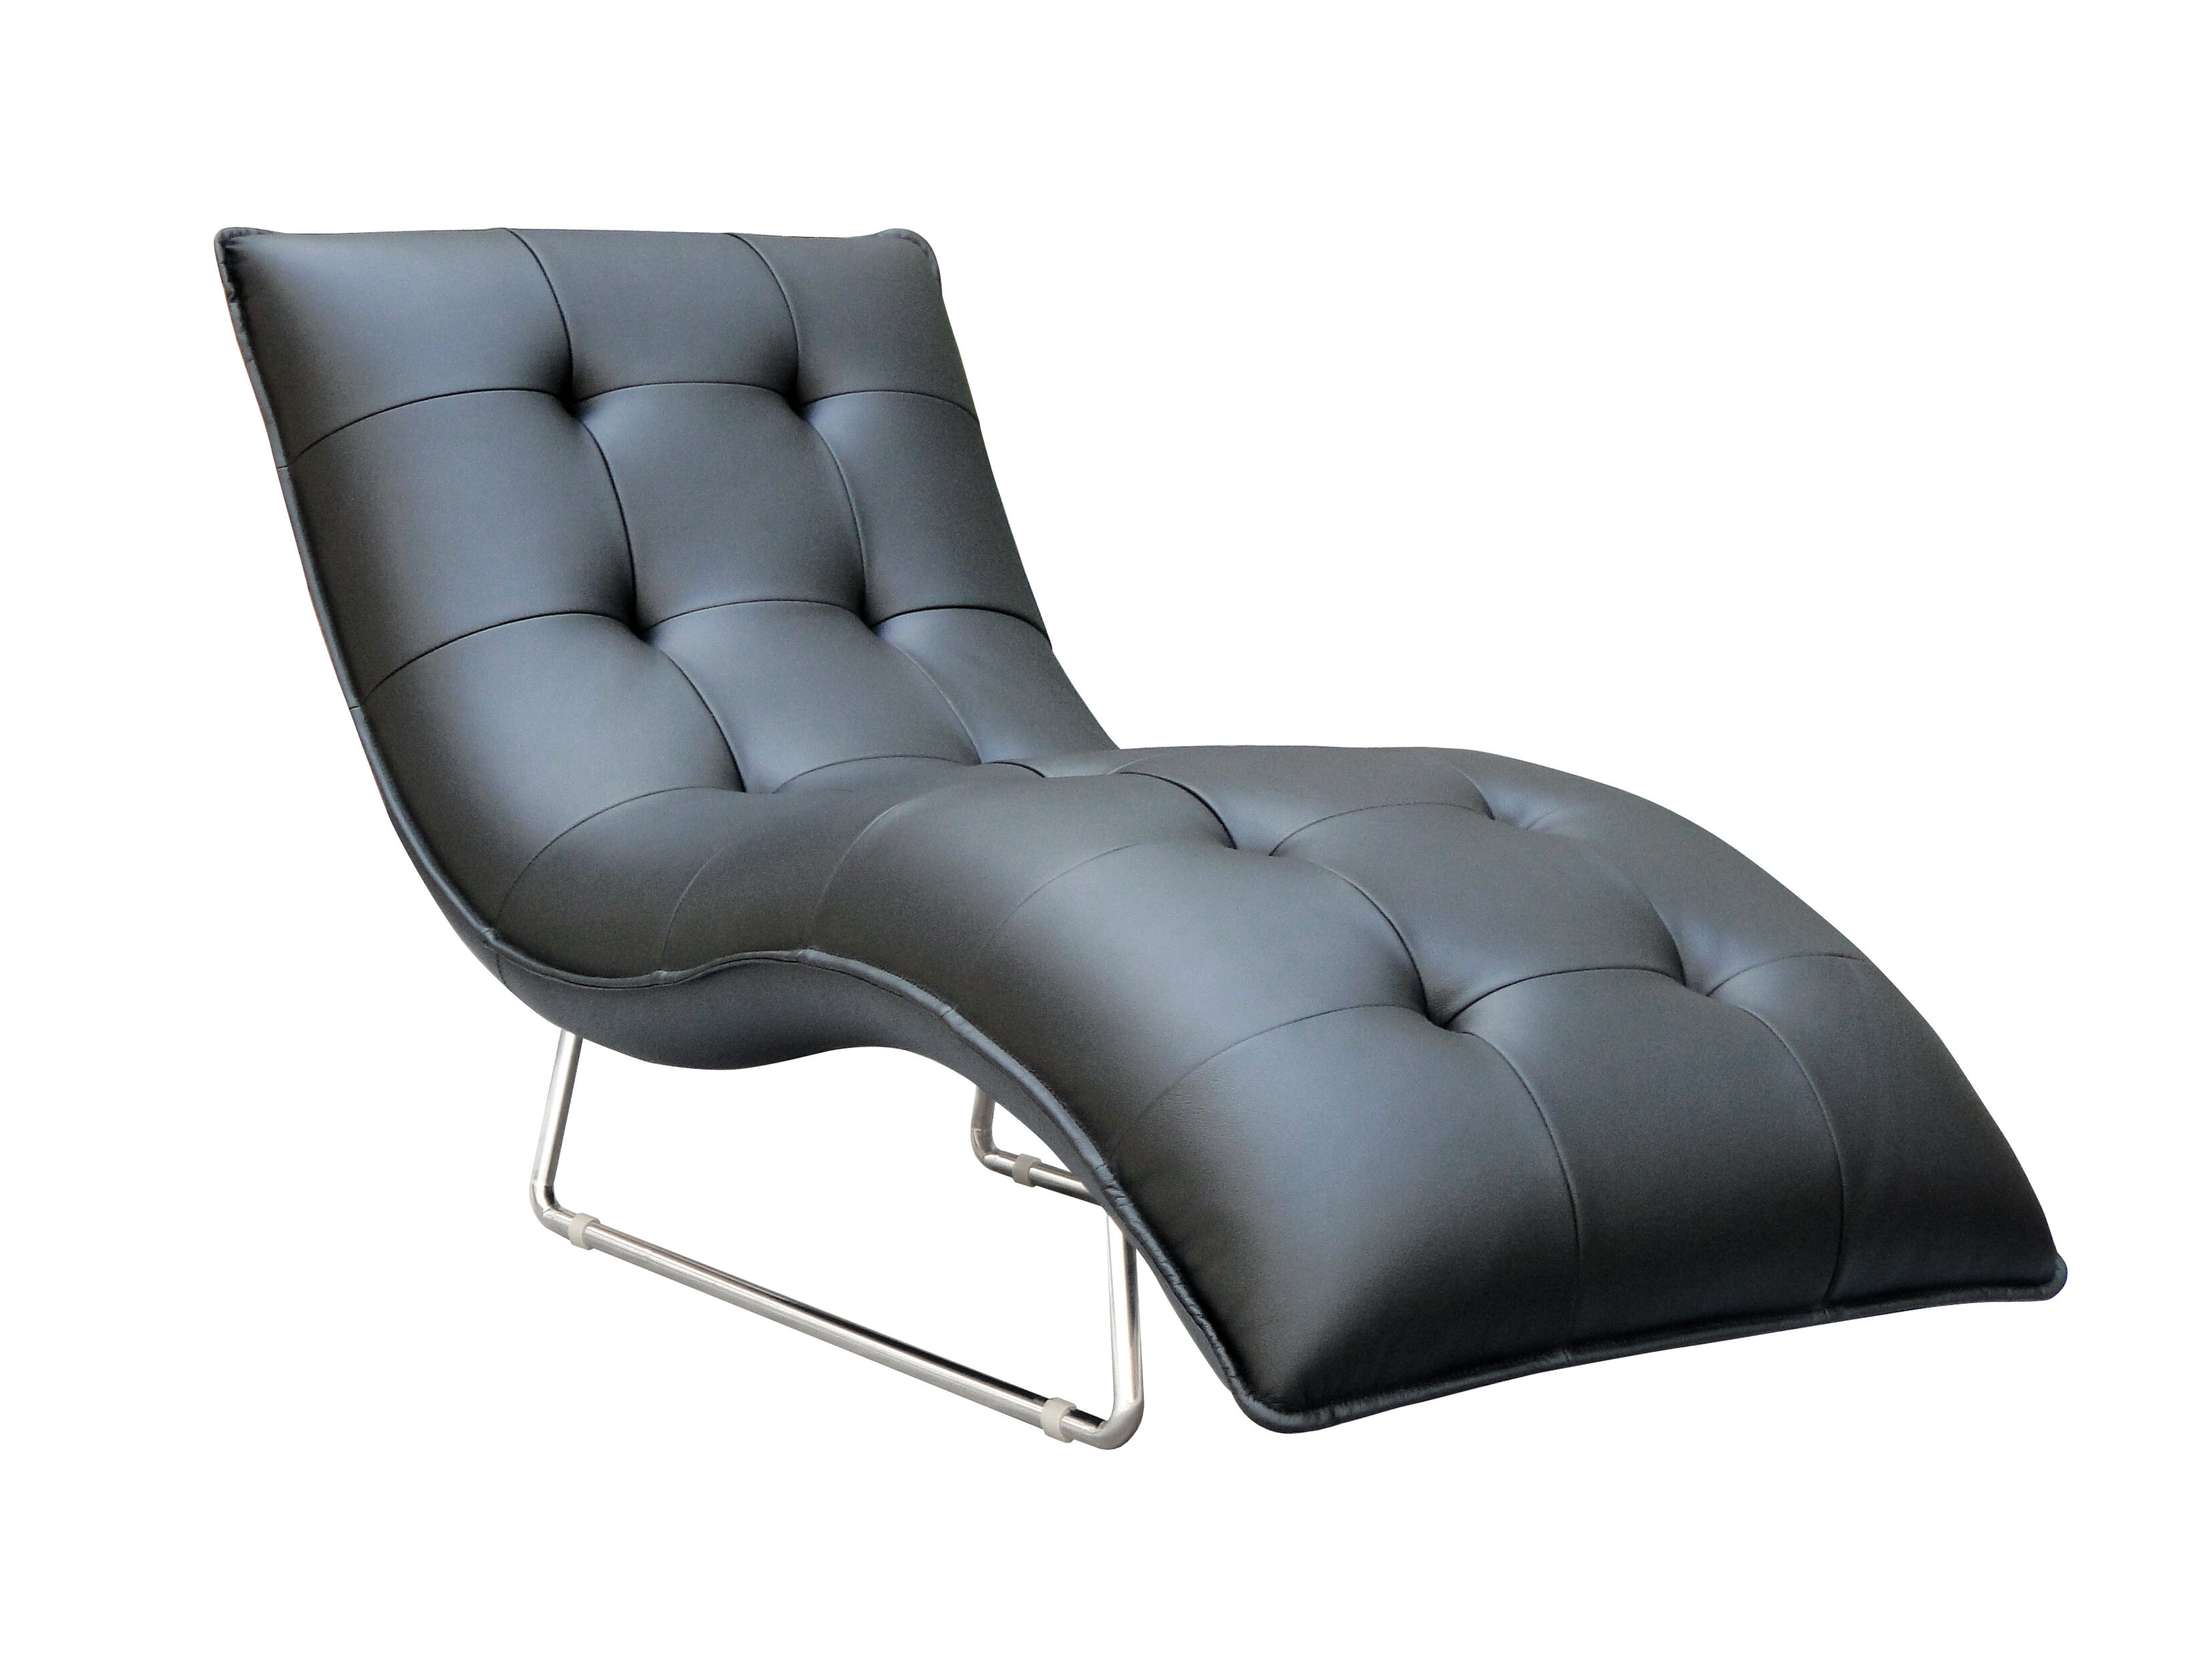 Wade logan alsatia leather chaise lounge wayfair